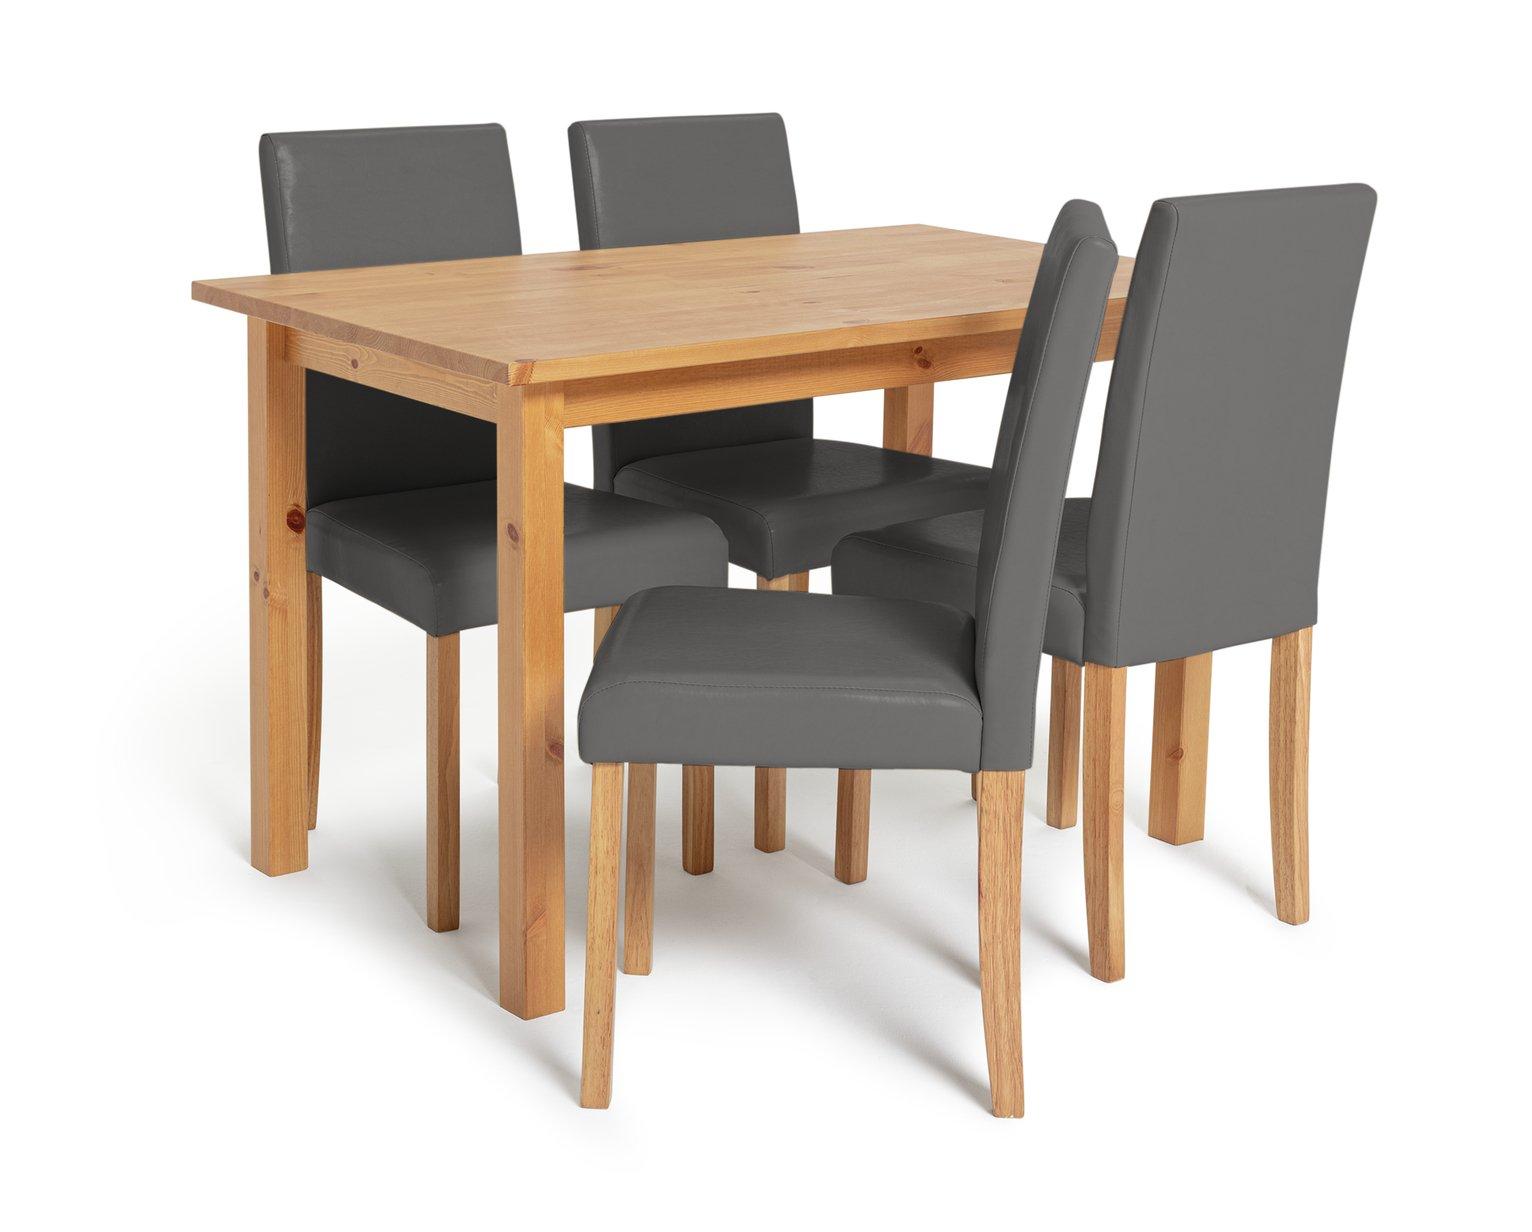 Habitat Ashdon Solid Wood Dining Table & 4 Grey Chairs